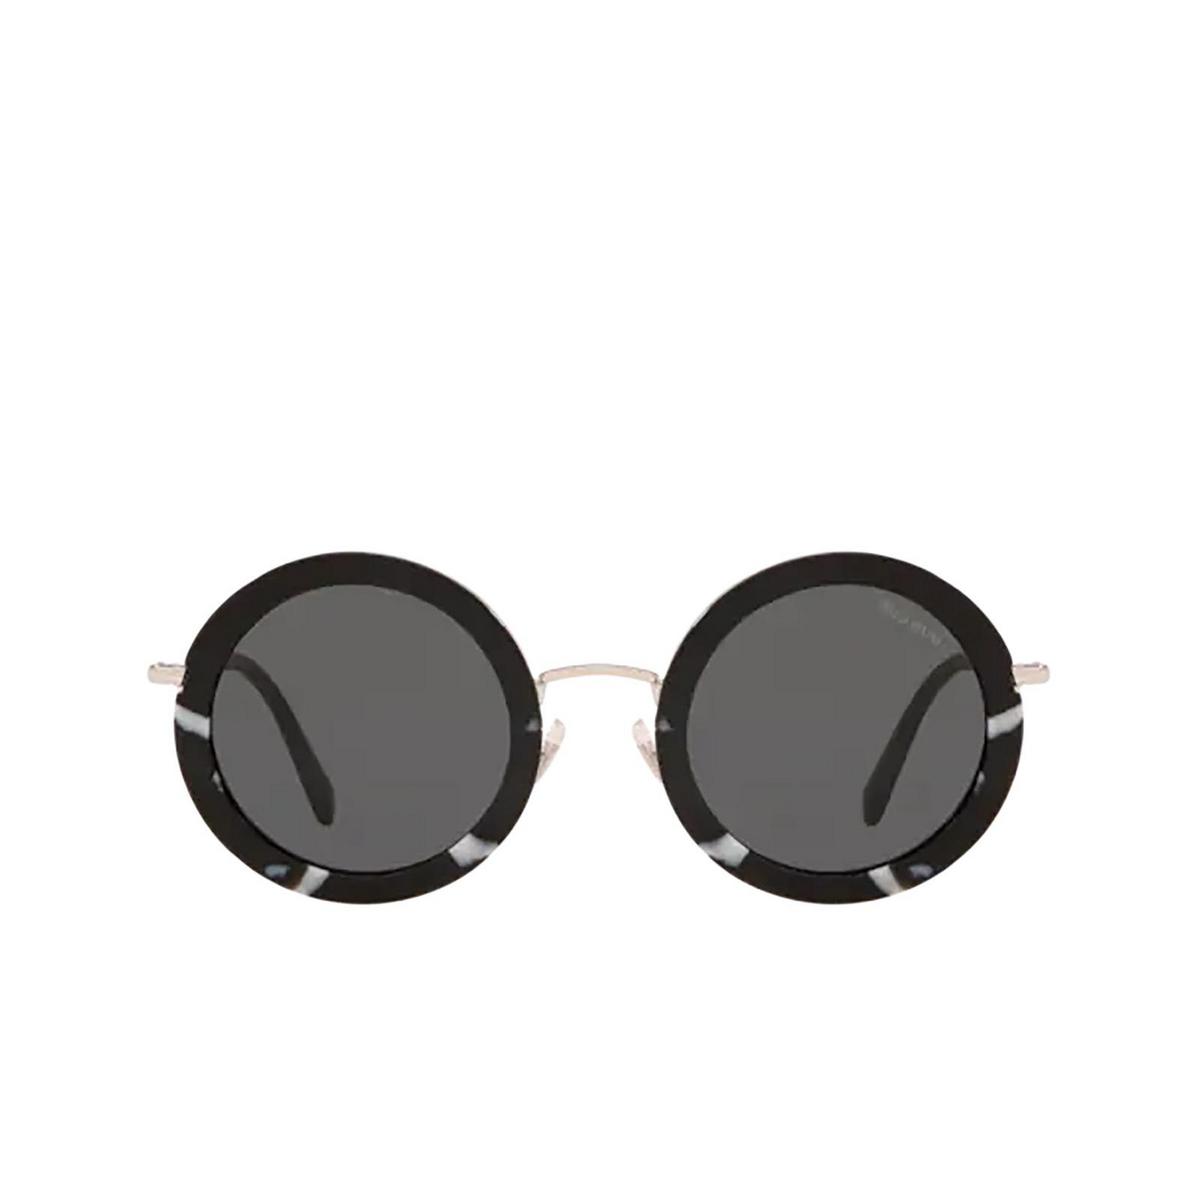 Miu Miu® Round Sunglasses: MU 59US color Havana Black / White PC75S0.